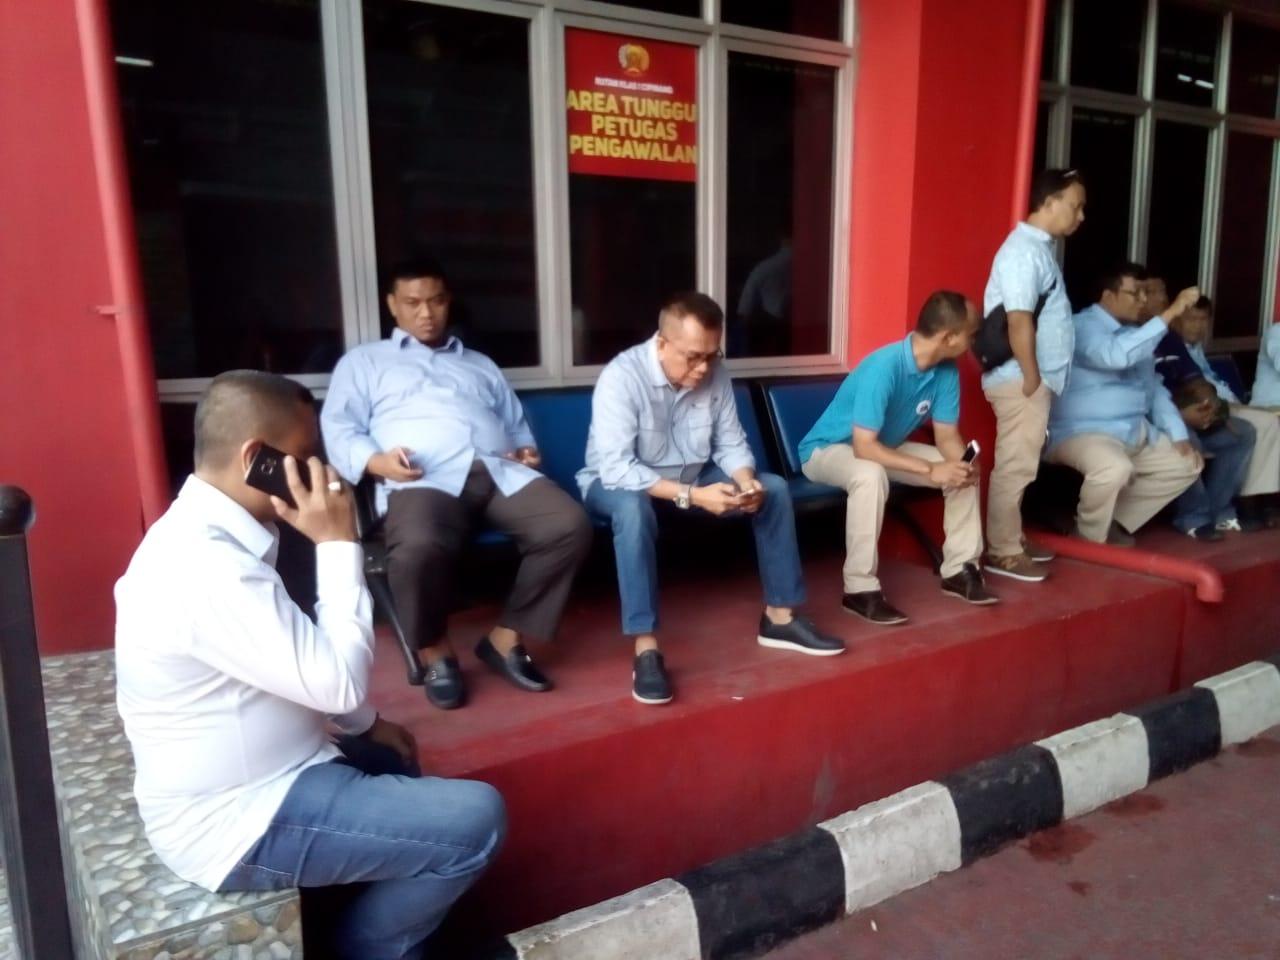 Ketua Seknas Prabowo-Sandi Uno, M Taufik Jenguk musisi Ahmad Dhani